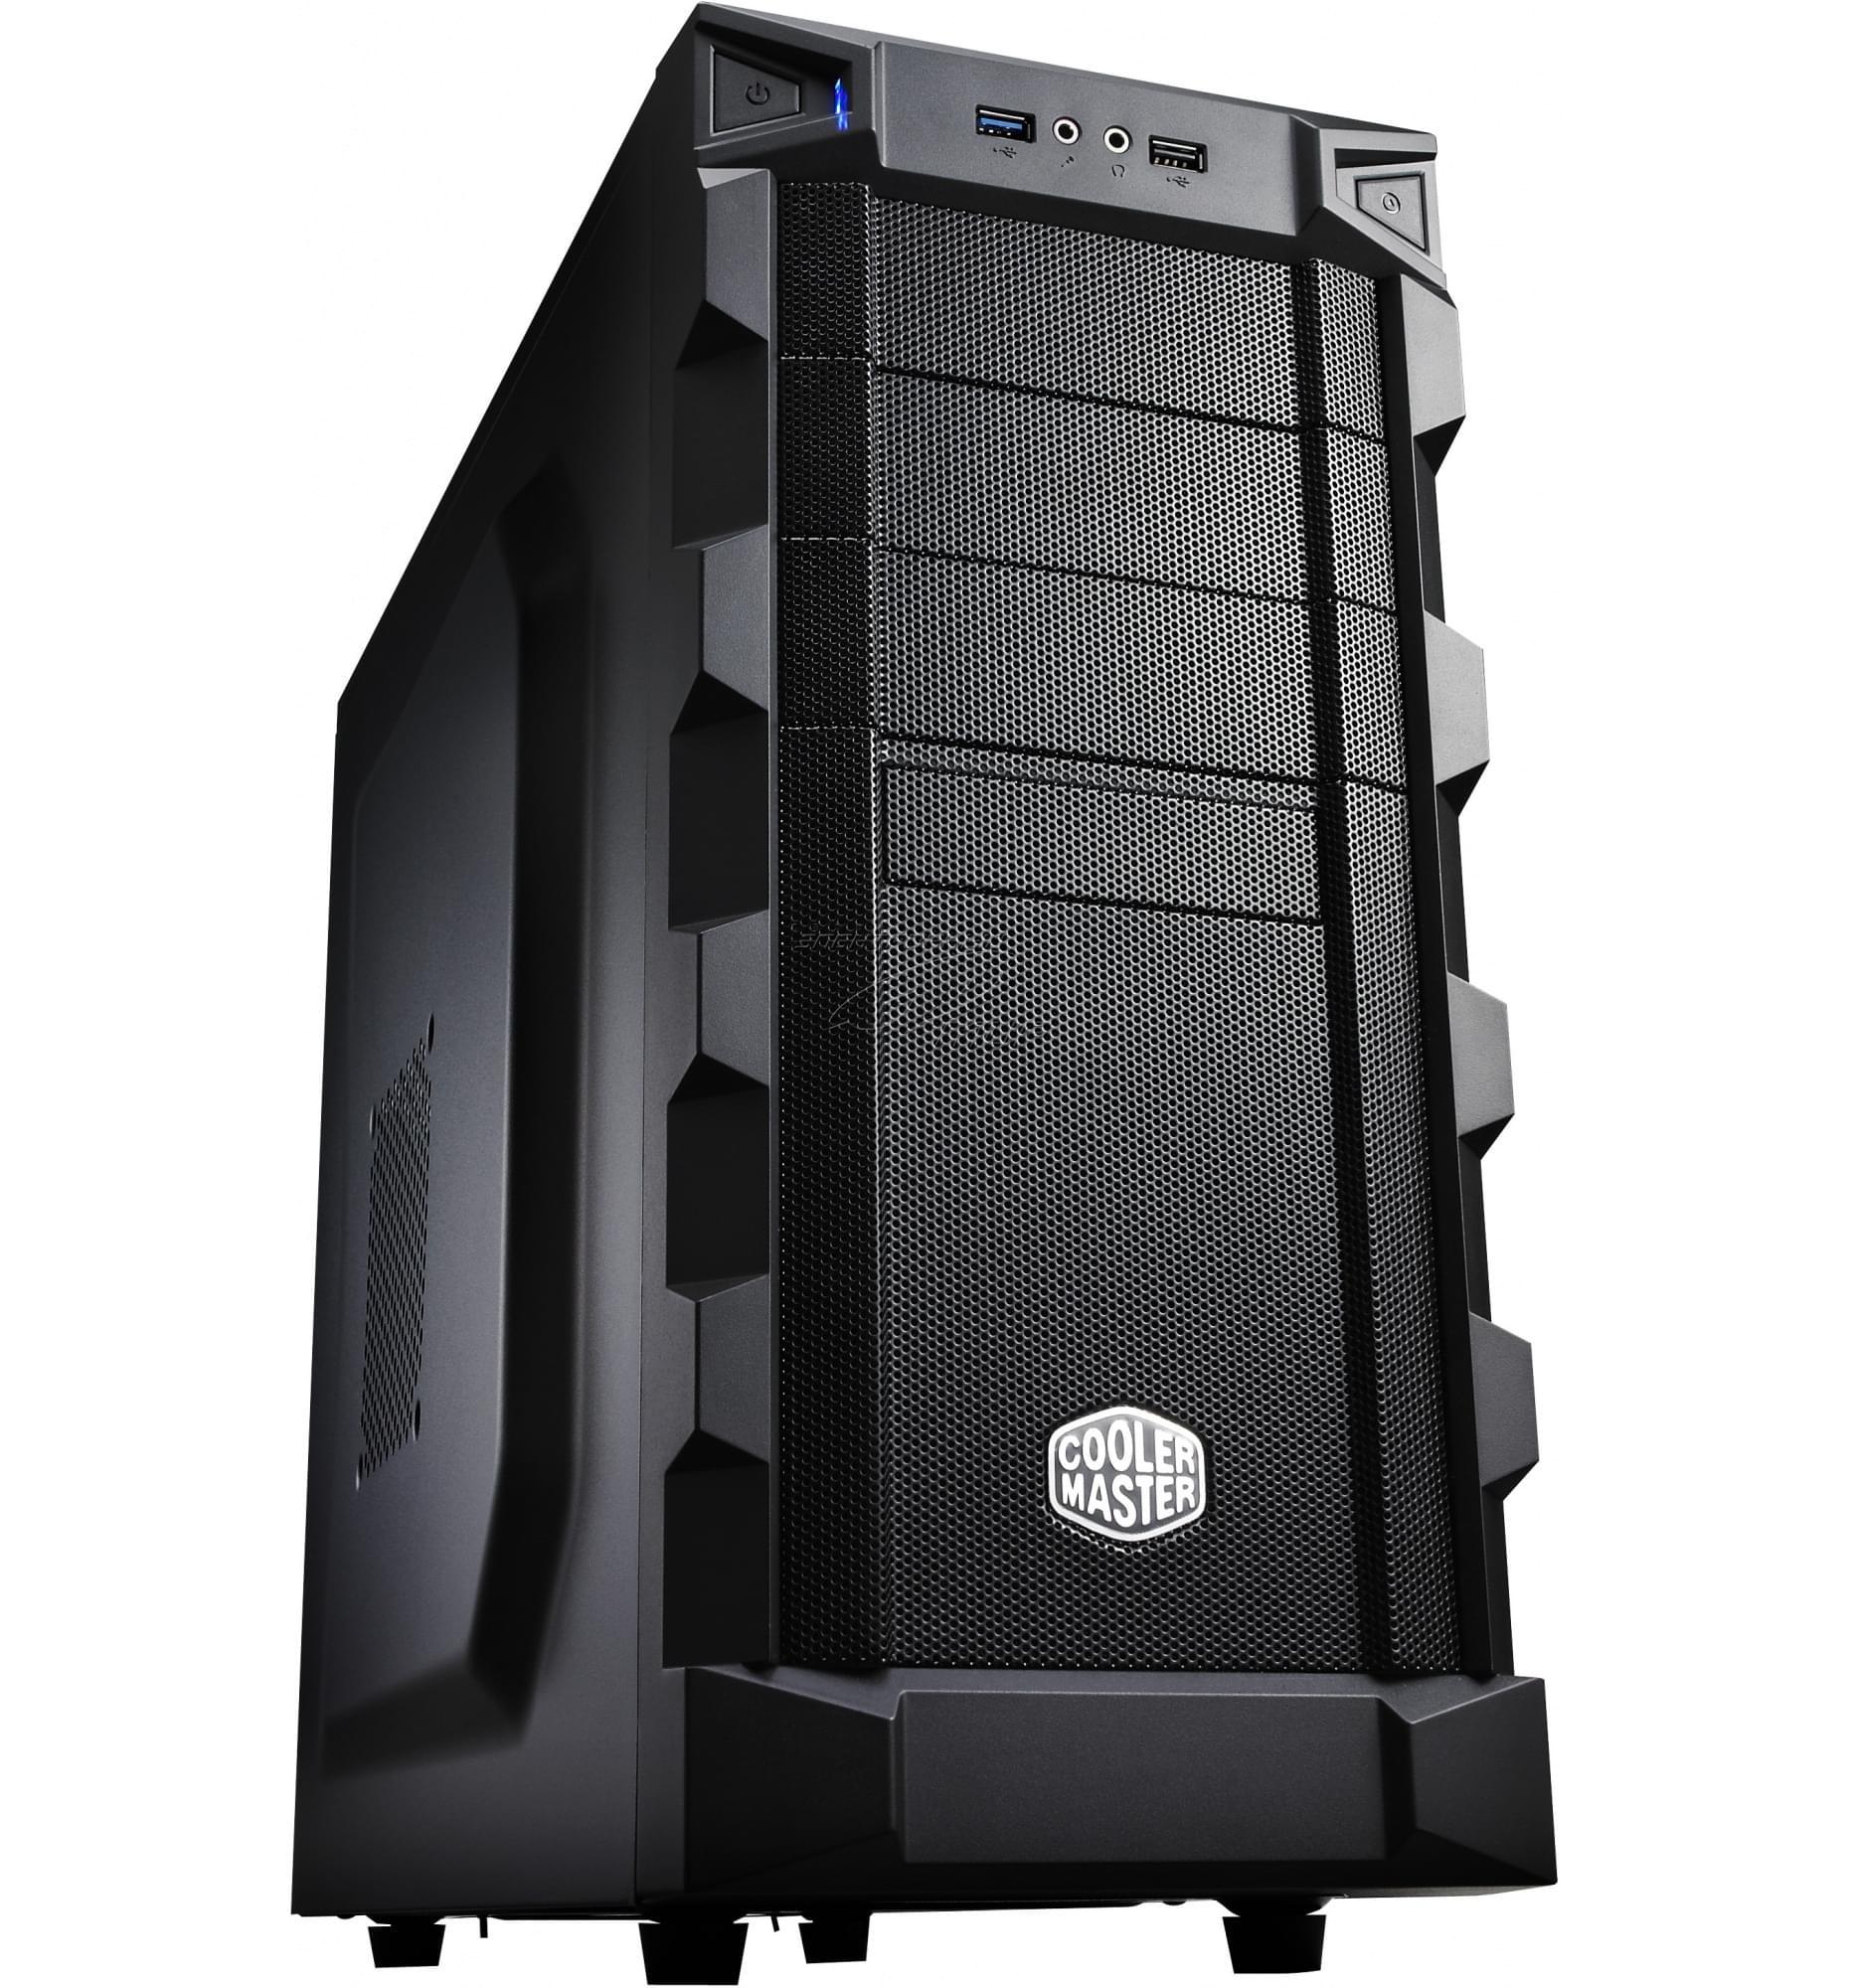 Cooler Master K280 RC-K280-KKP500 (RC-K280-KKP500) - Achat / Vente Boîtier PC sur Cybertek.fr - 0